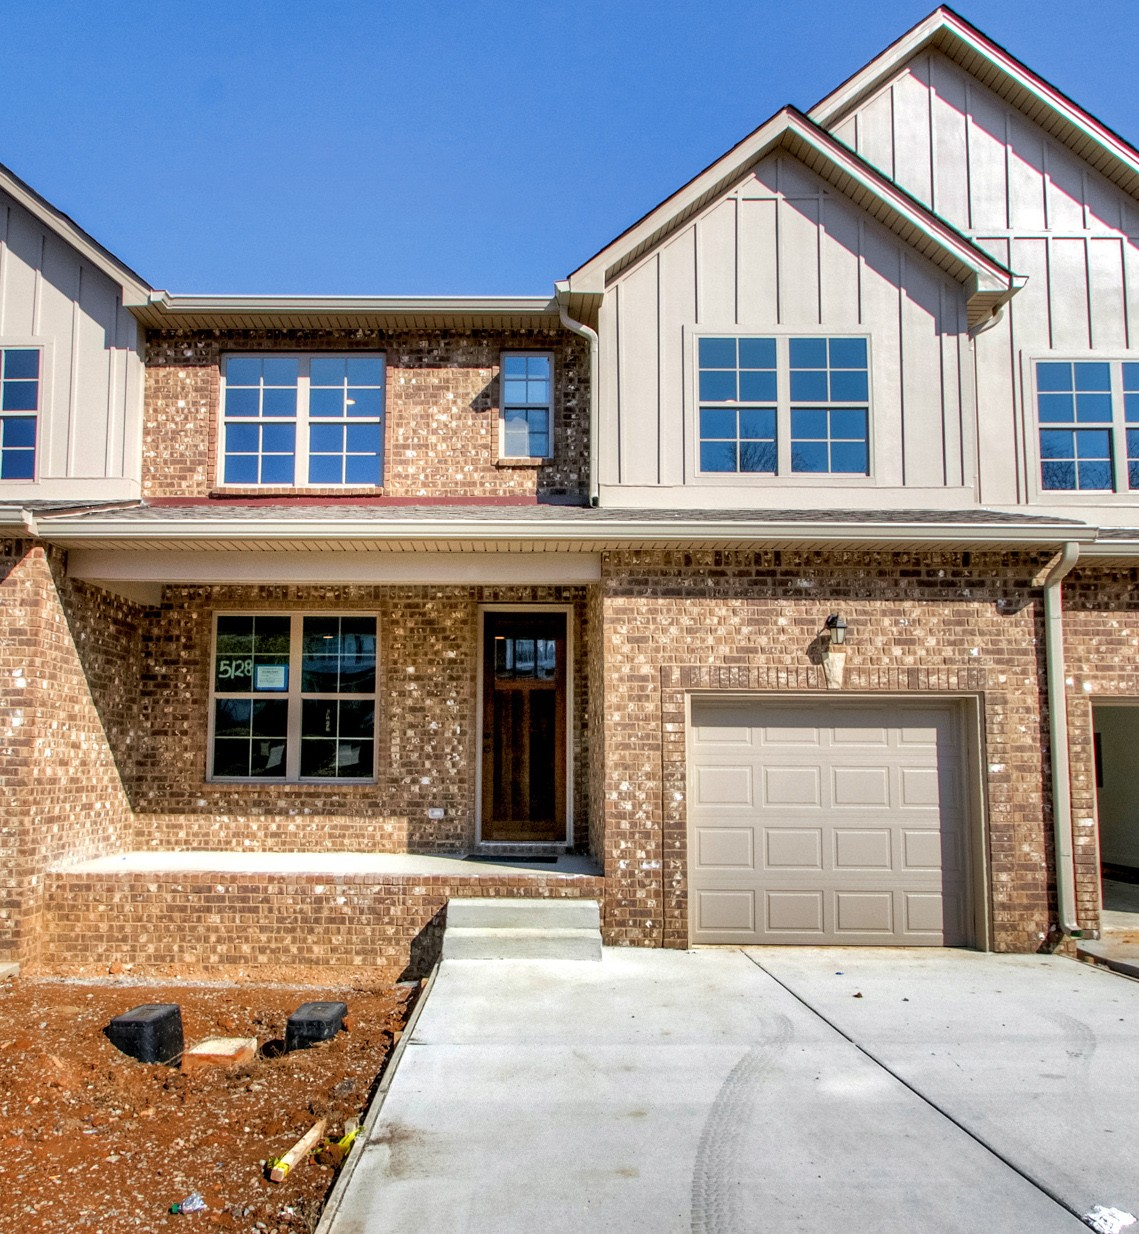 5128 Southfork Blvd, Old Hickory, TN 37138 - Old Hickory, TN real estate listing